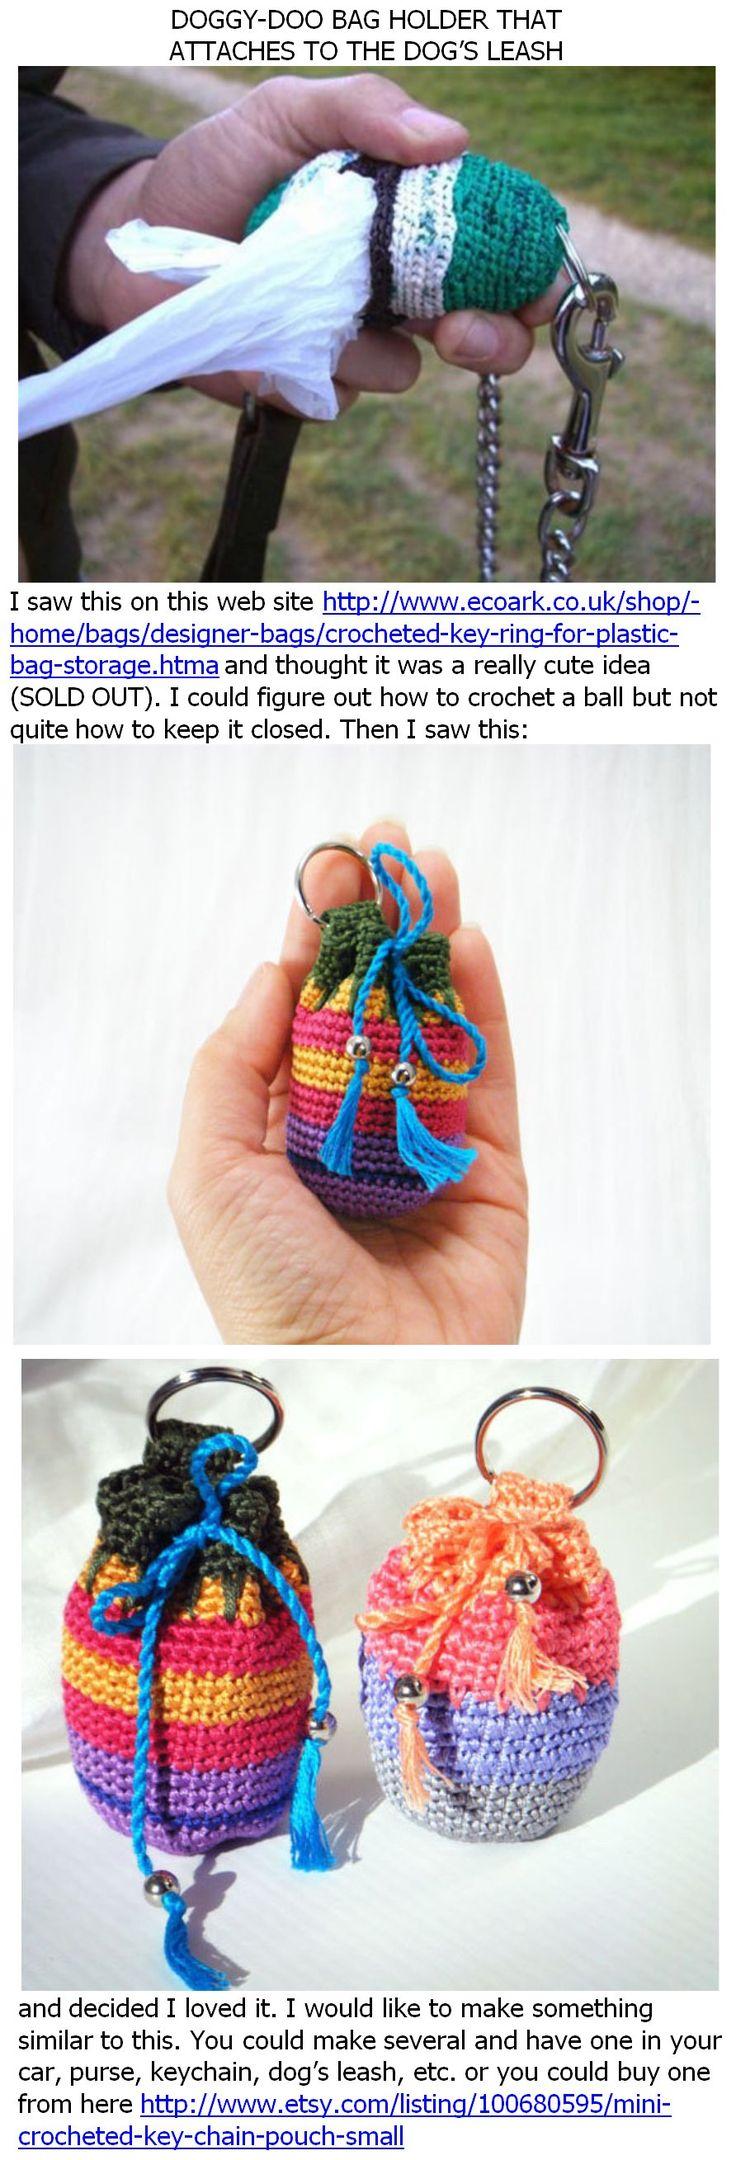 Doggy-doo bag holder to crochet - *Inspiration* Para guardar las bolsas del perro